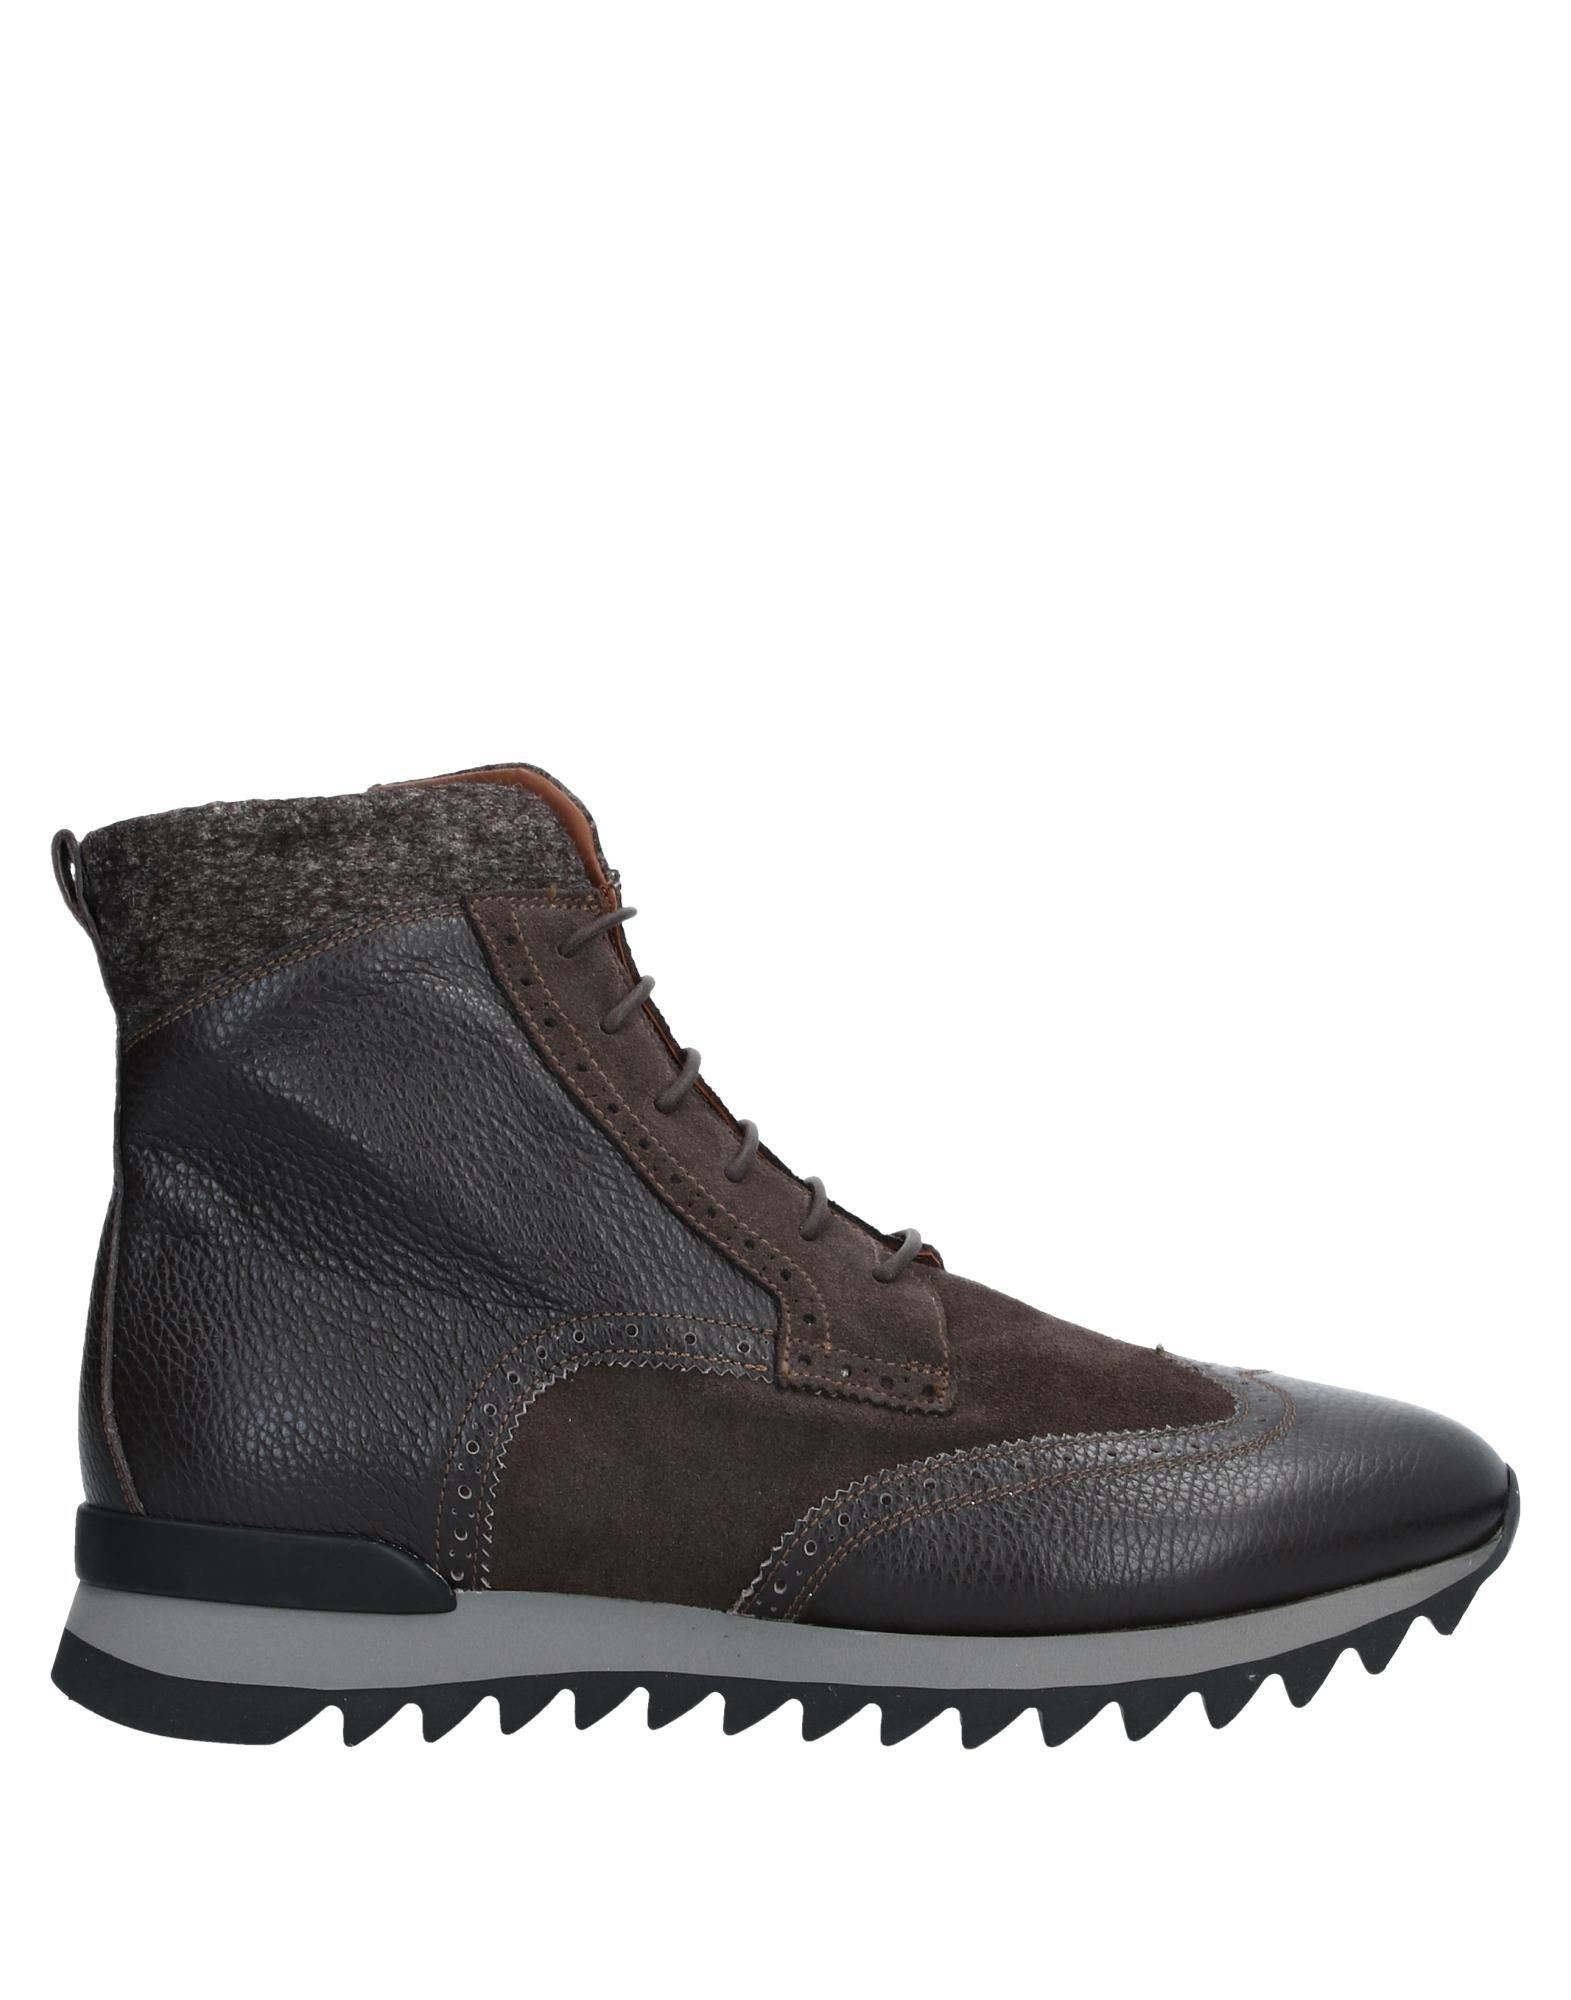 ALBERTO GUARDIANI Высокие кеды и кроссовки alberto guardiani высокие кеды и кроссовки